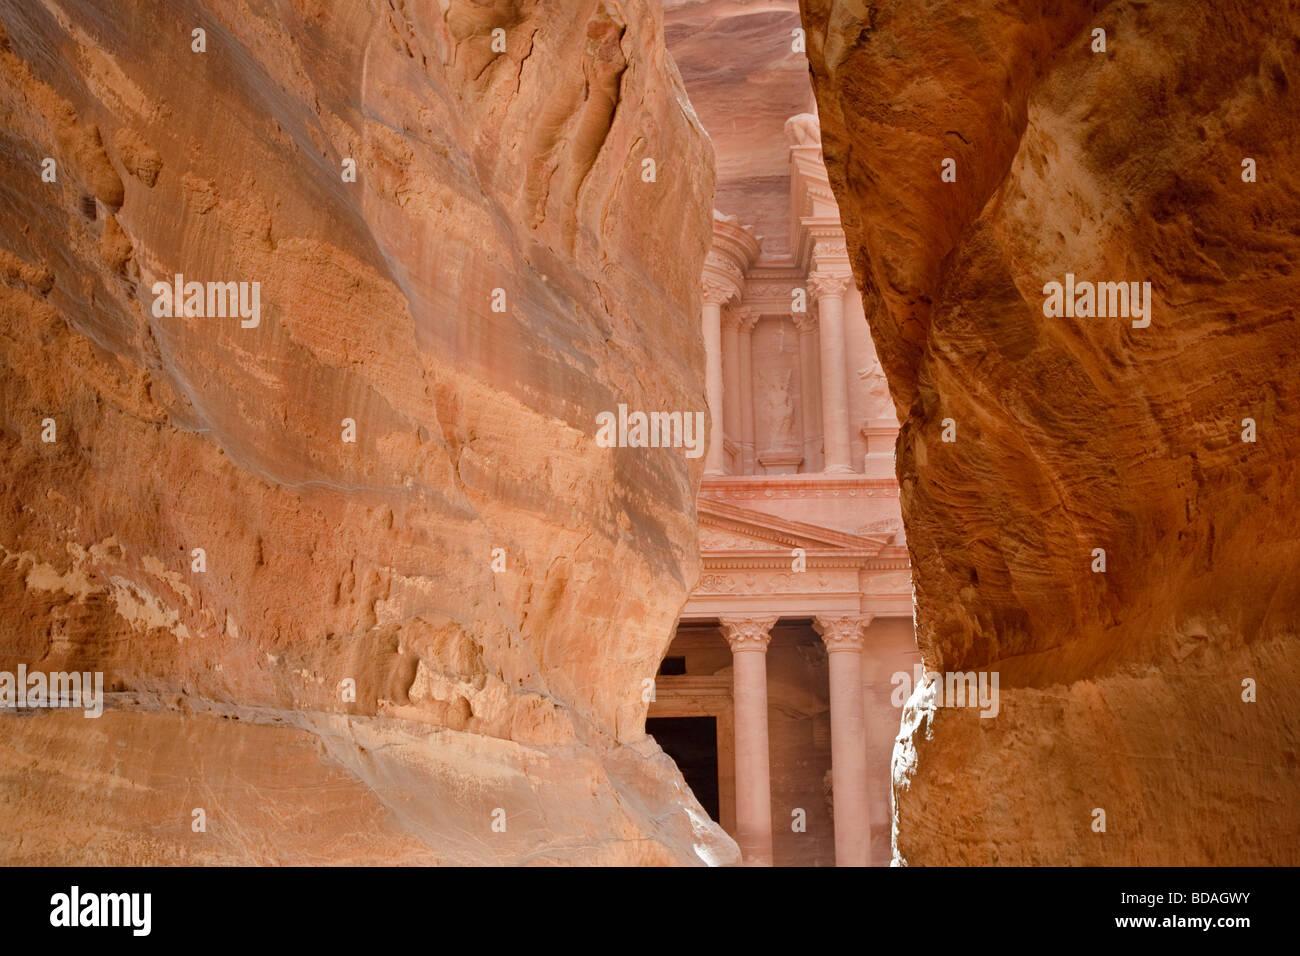 La vue du Trésor, le BSRF Le Siq, Petra, Jordanie Photo Stock